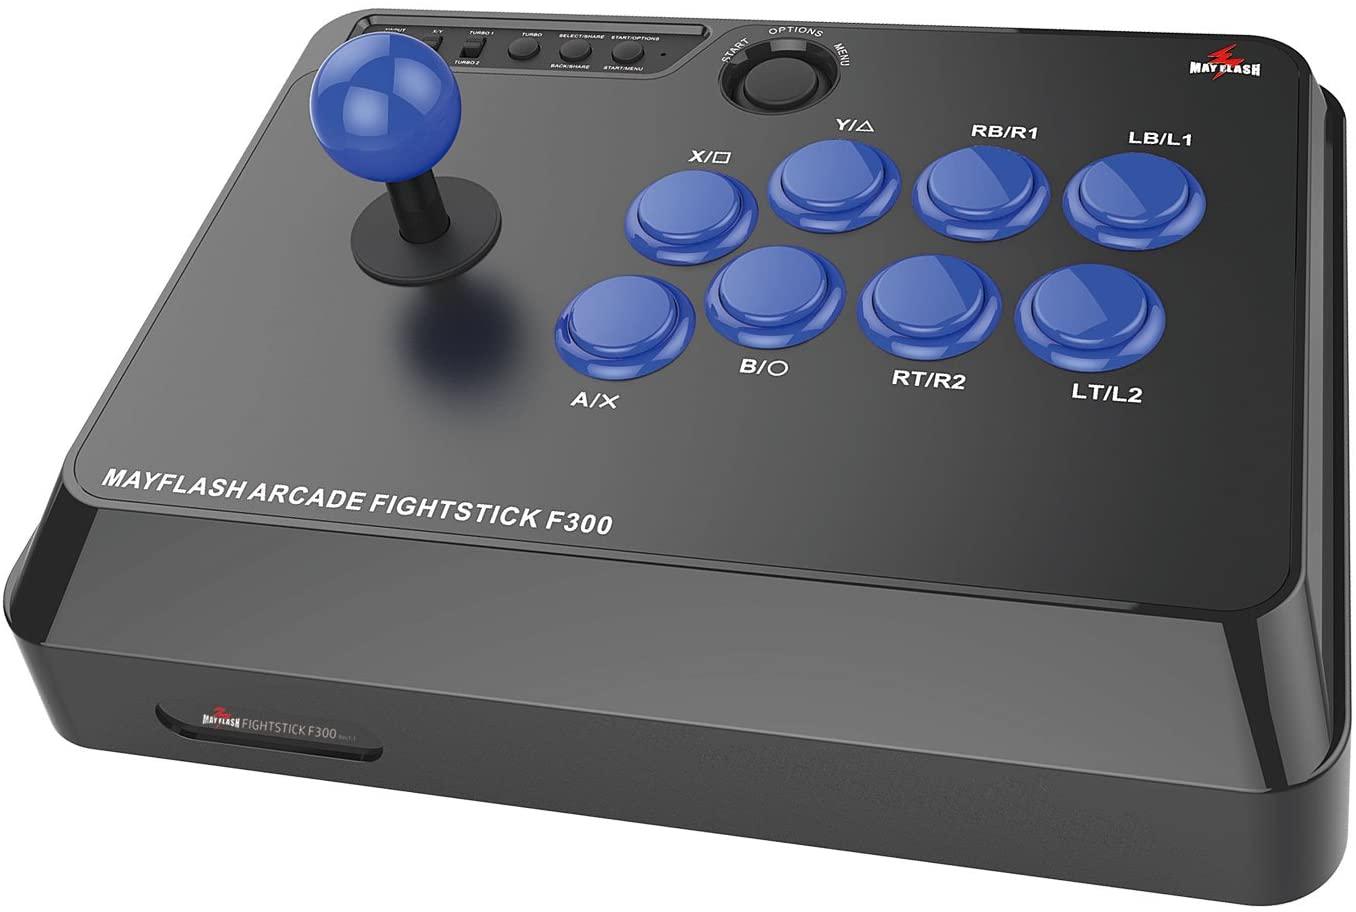 Mayflash joystick retro pc